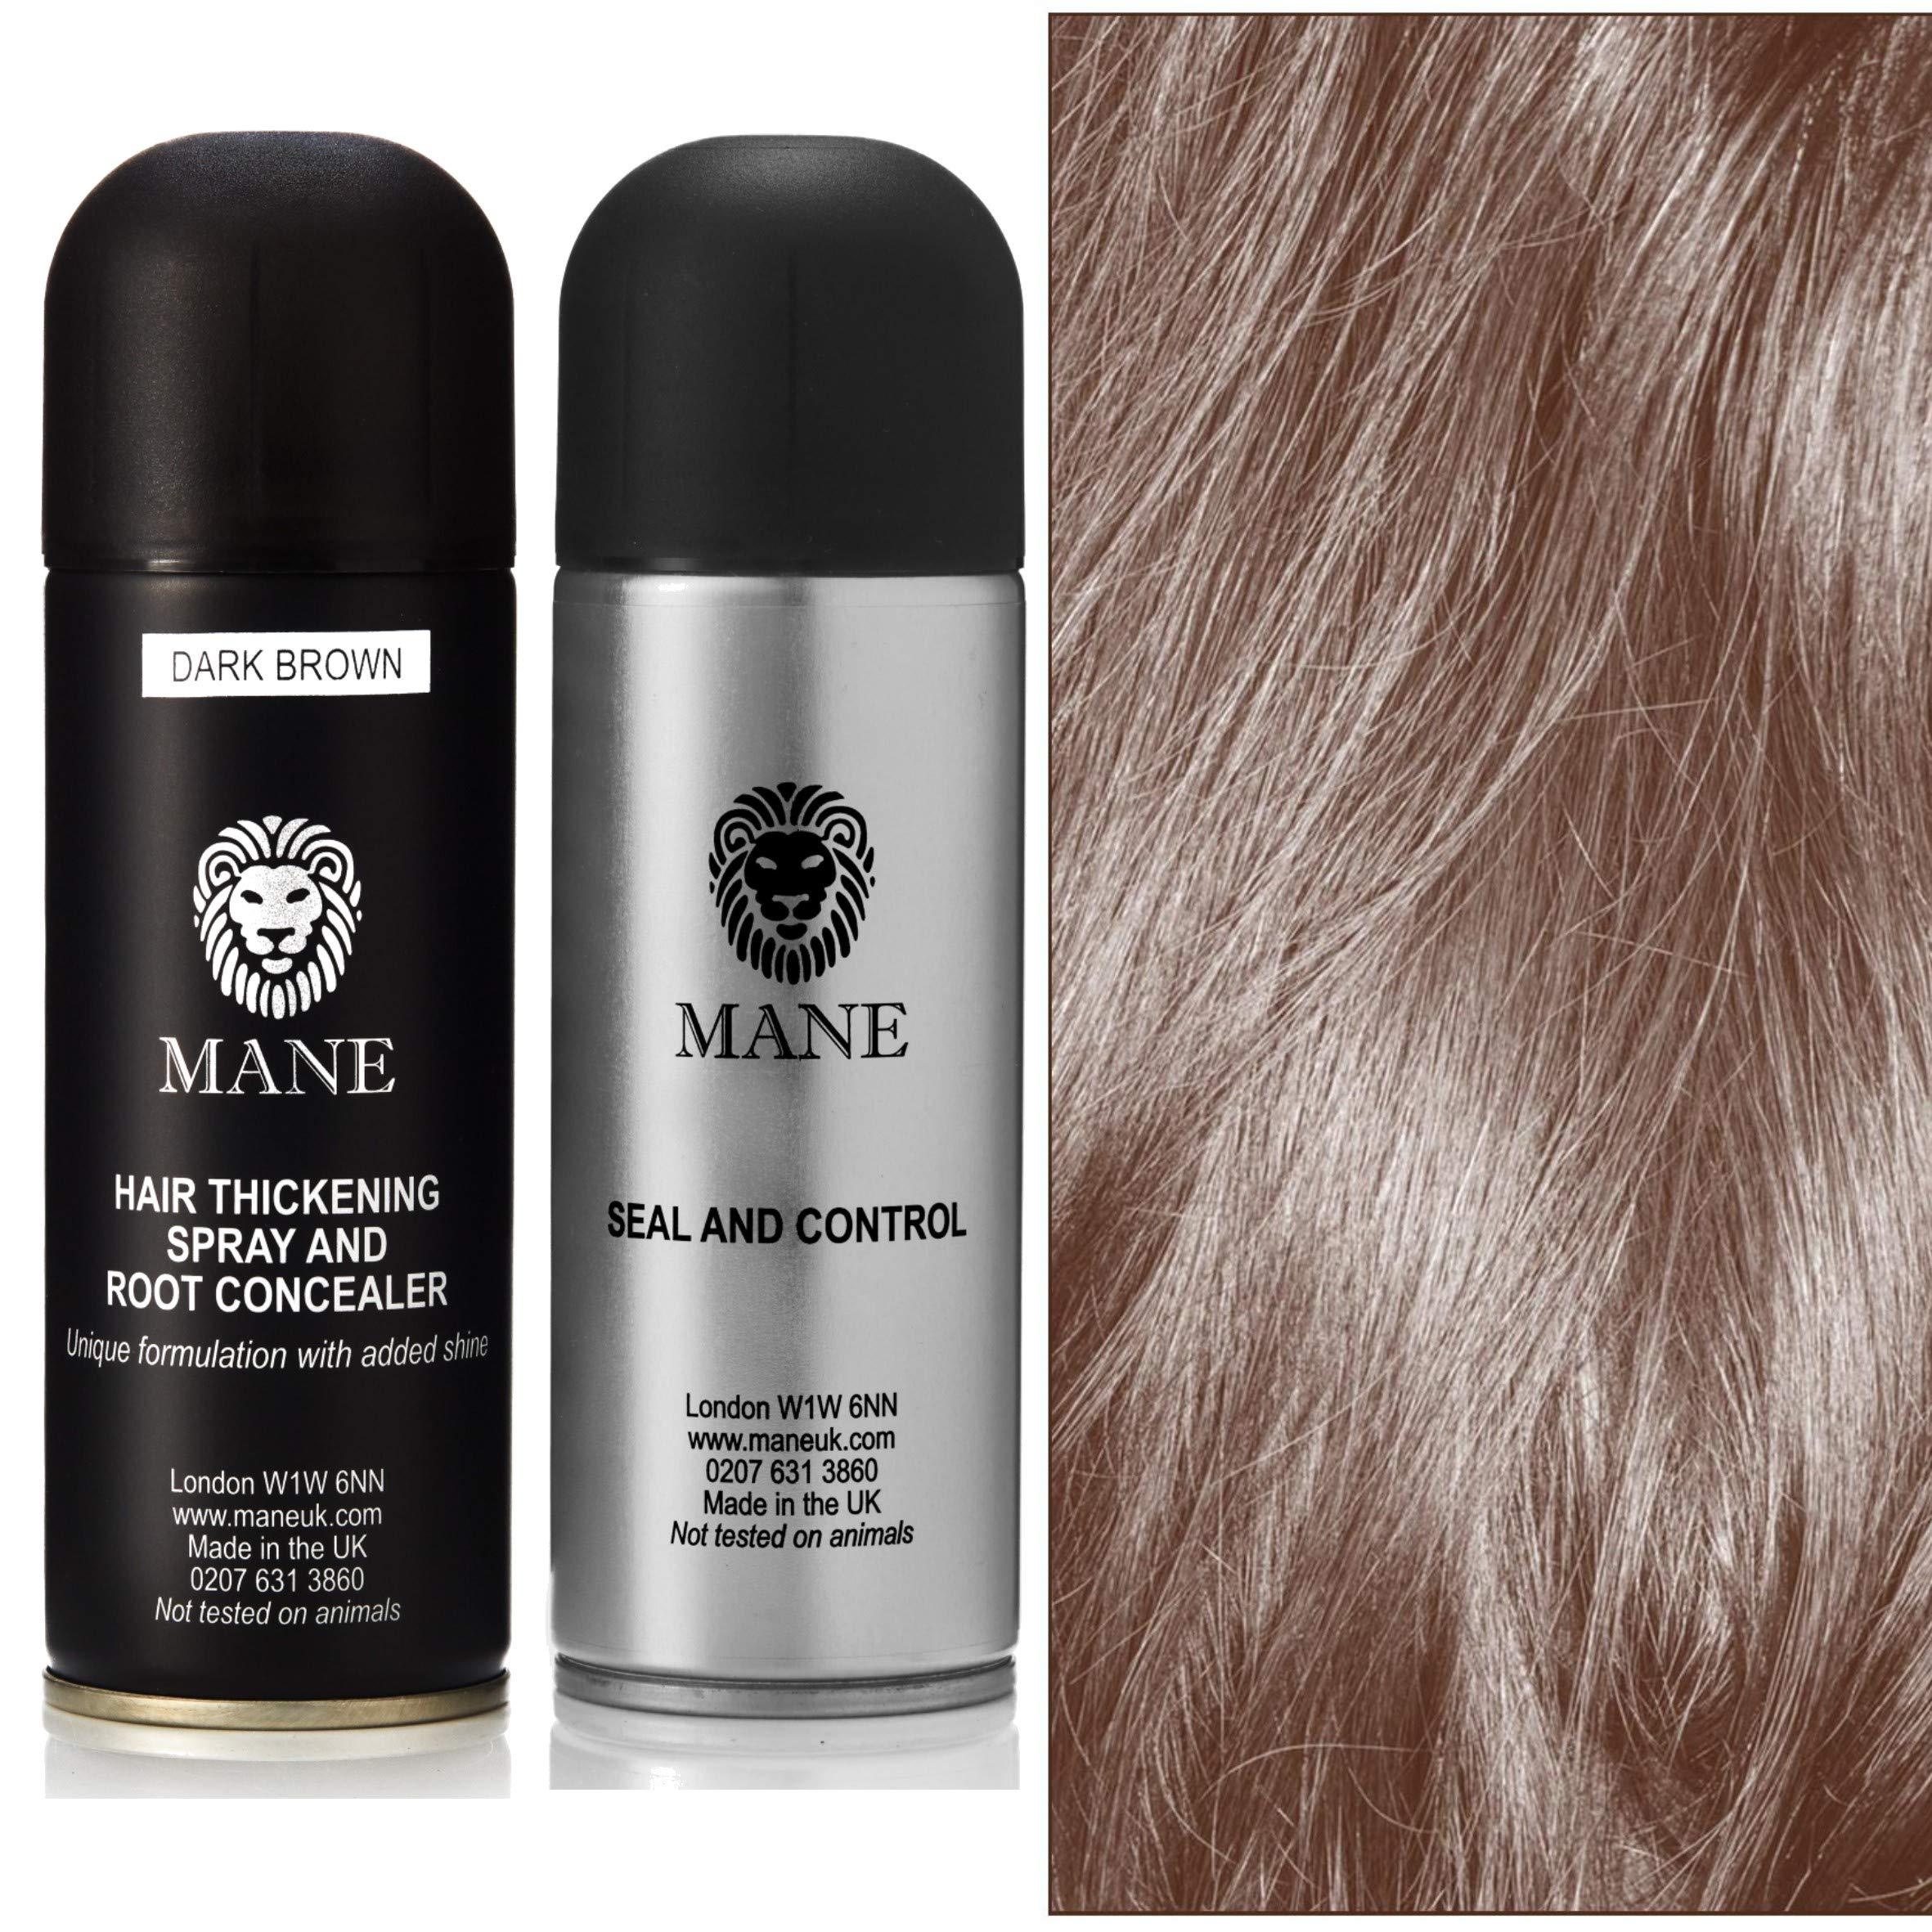 Mane Coloured Hair Thickening Spray Dark Brown 200ml with Seal & Control 200ml Aerosol Fixing Spray